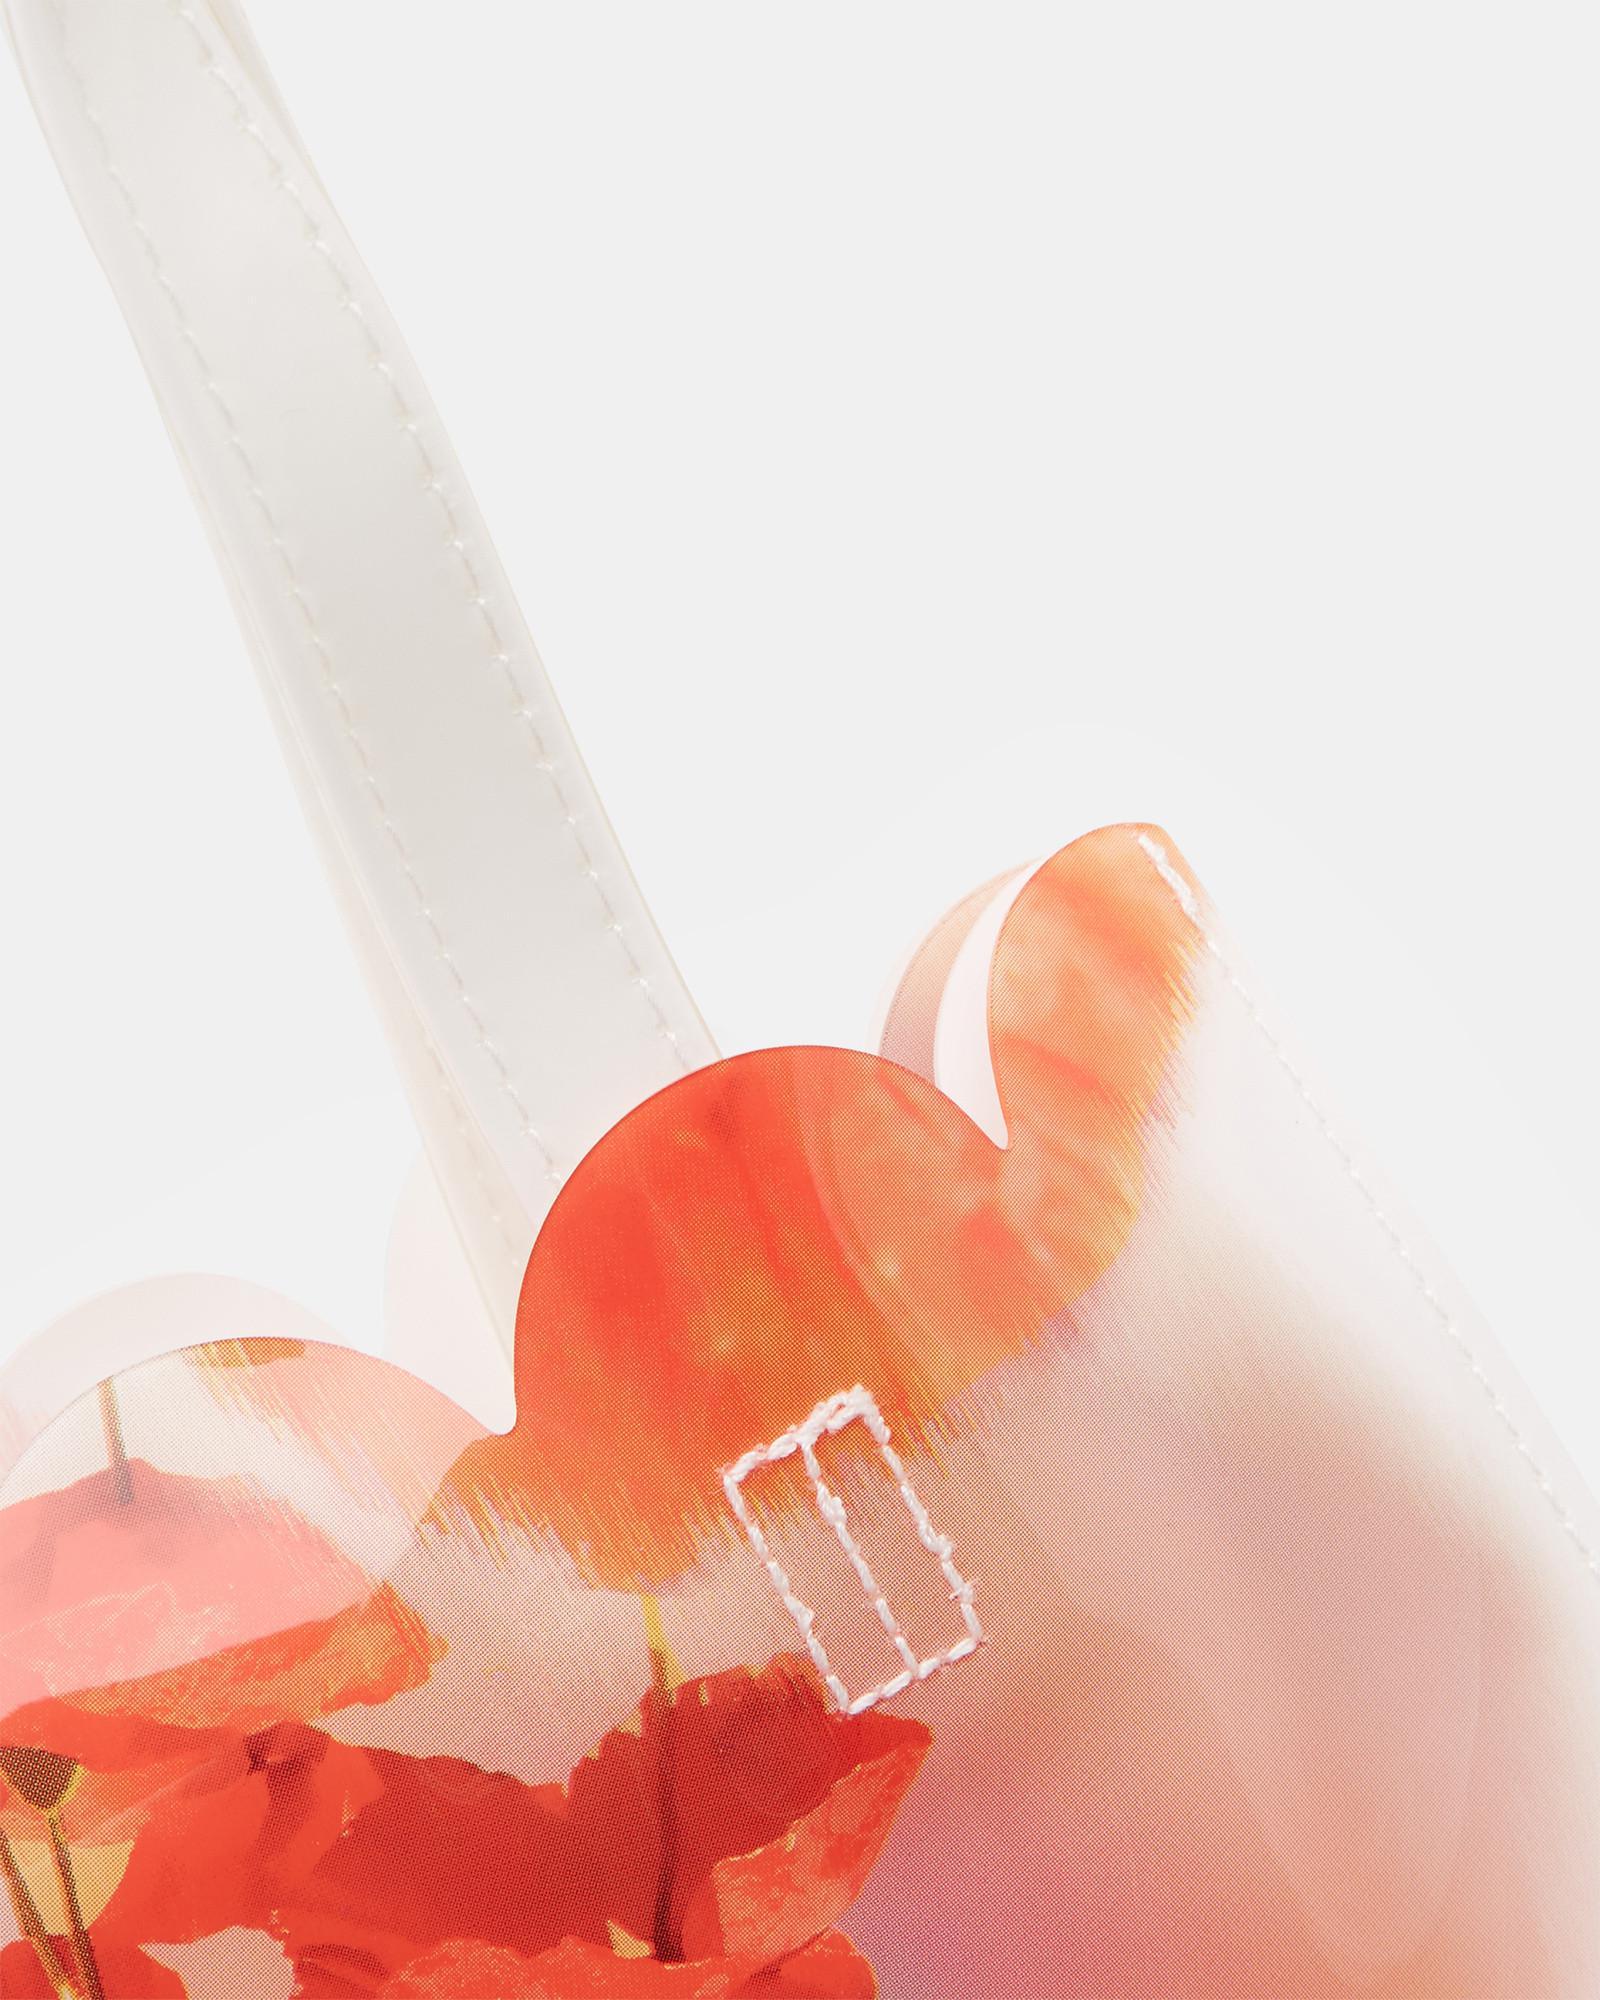 8668560d814e2 Ted Baker Playful Poppy Small Shopper Bag in Red - Lyst